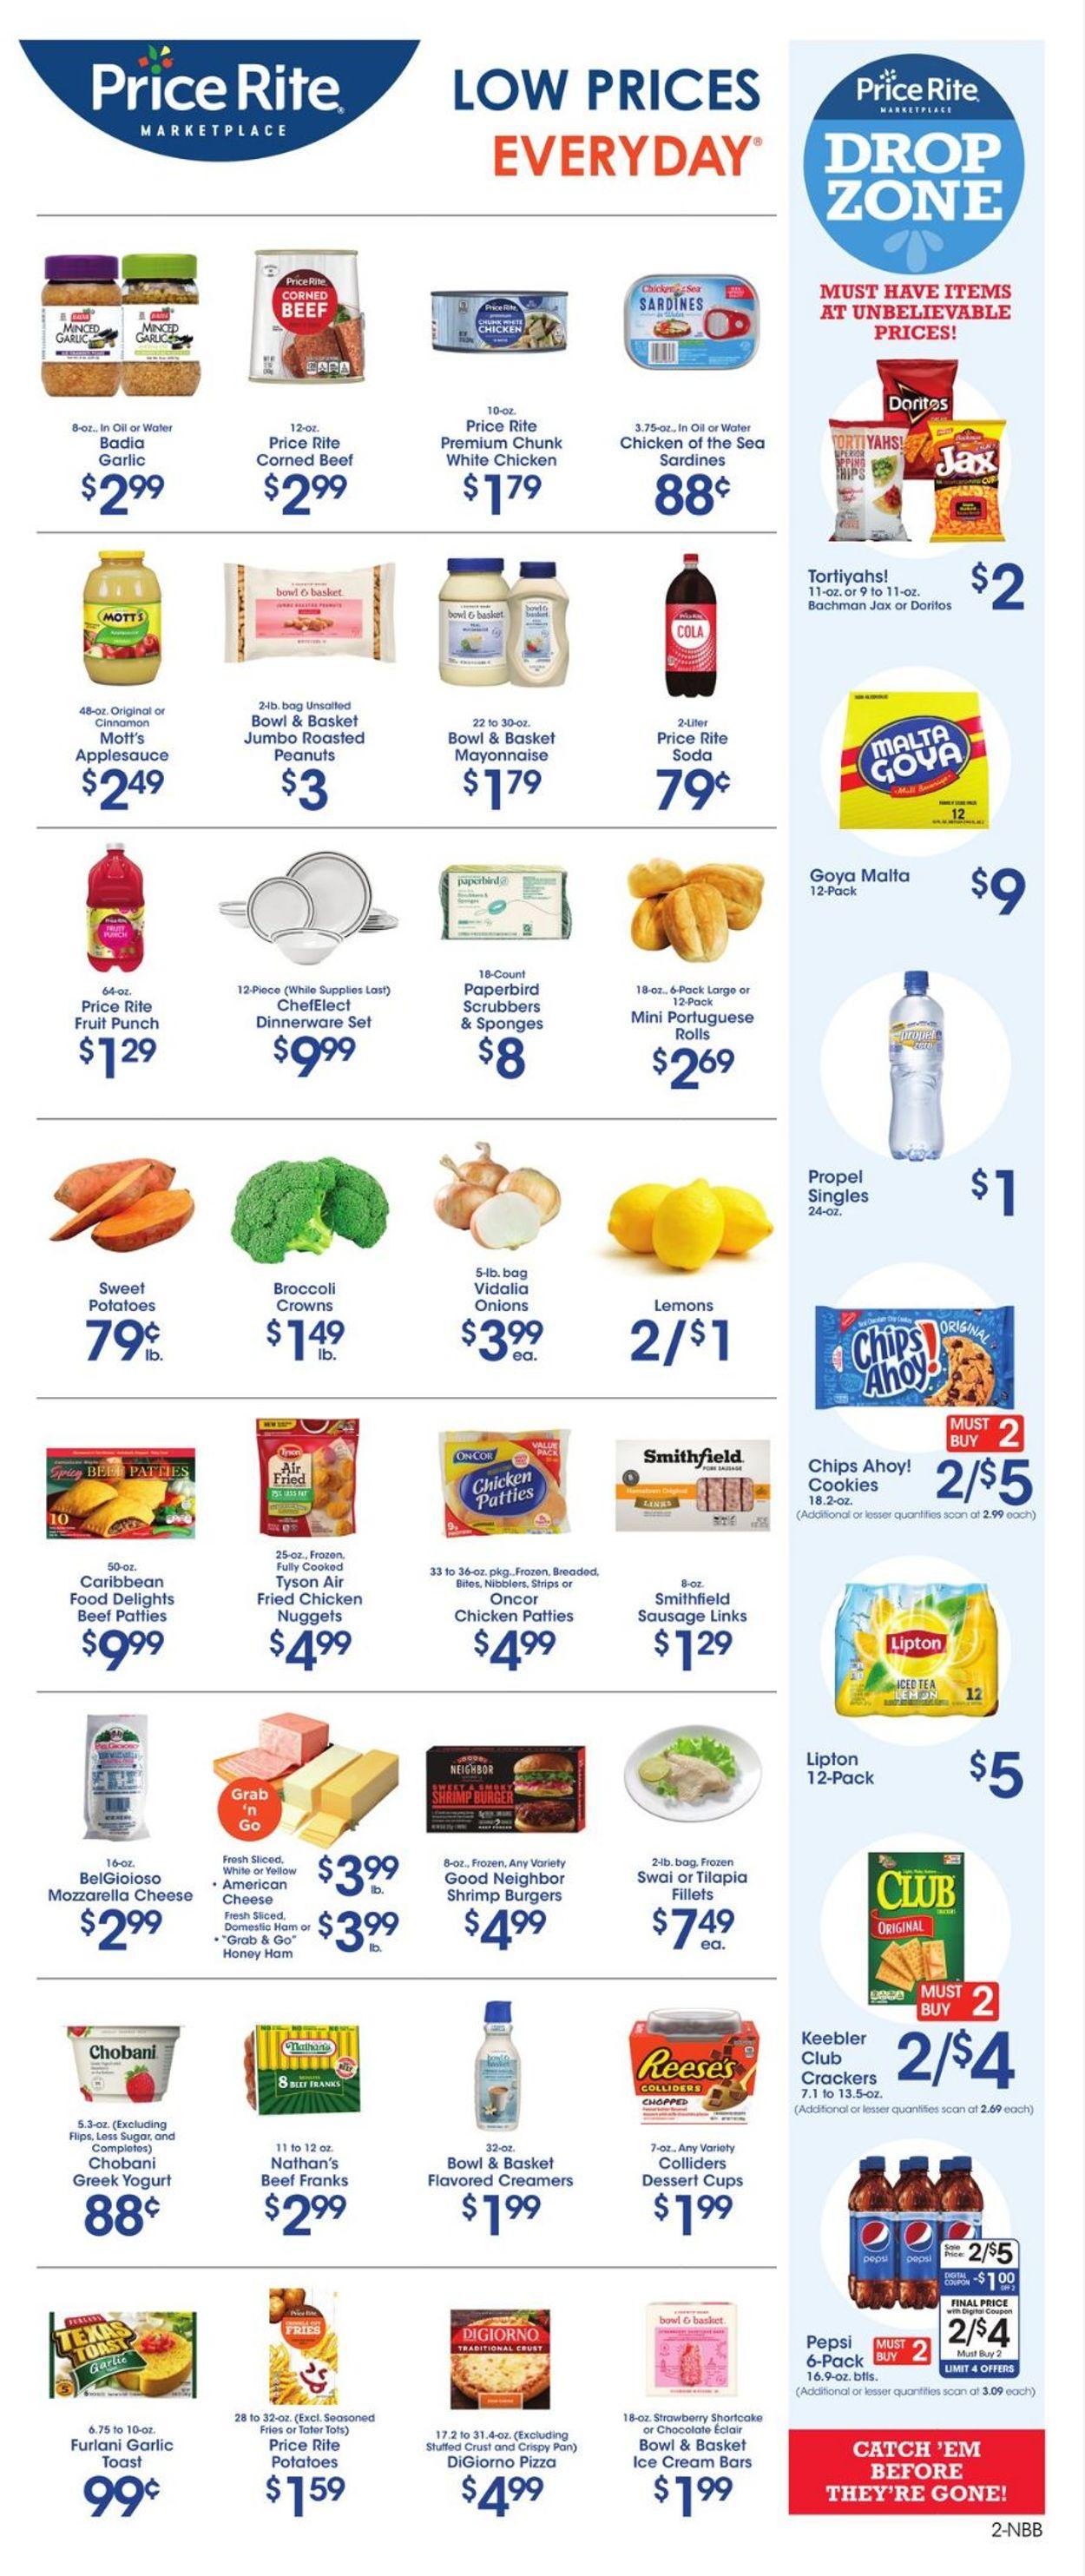 Price Rite Weekly Ad Circular - valid 07/23-07/29/2021 (Page 2)